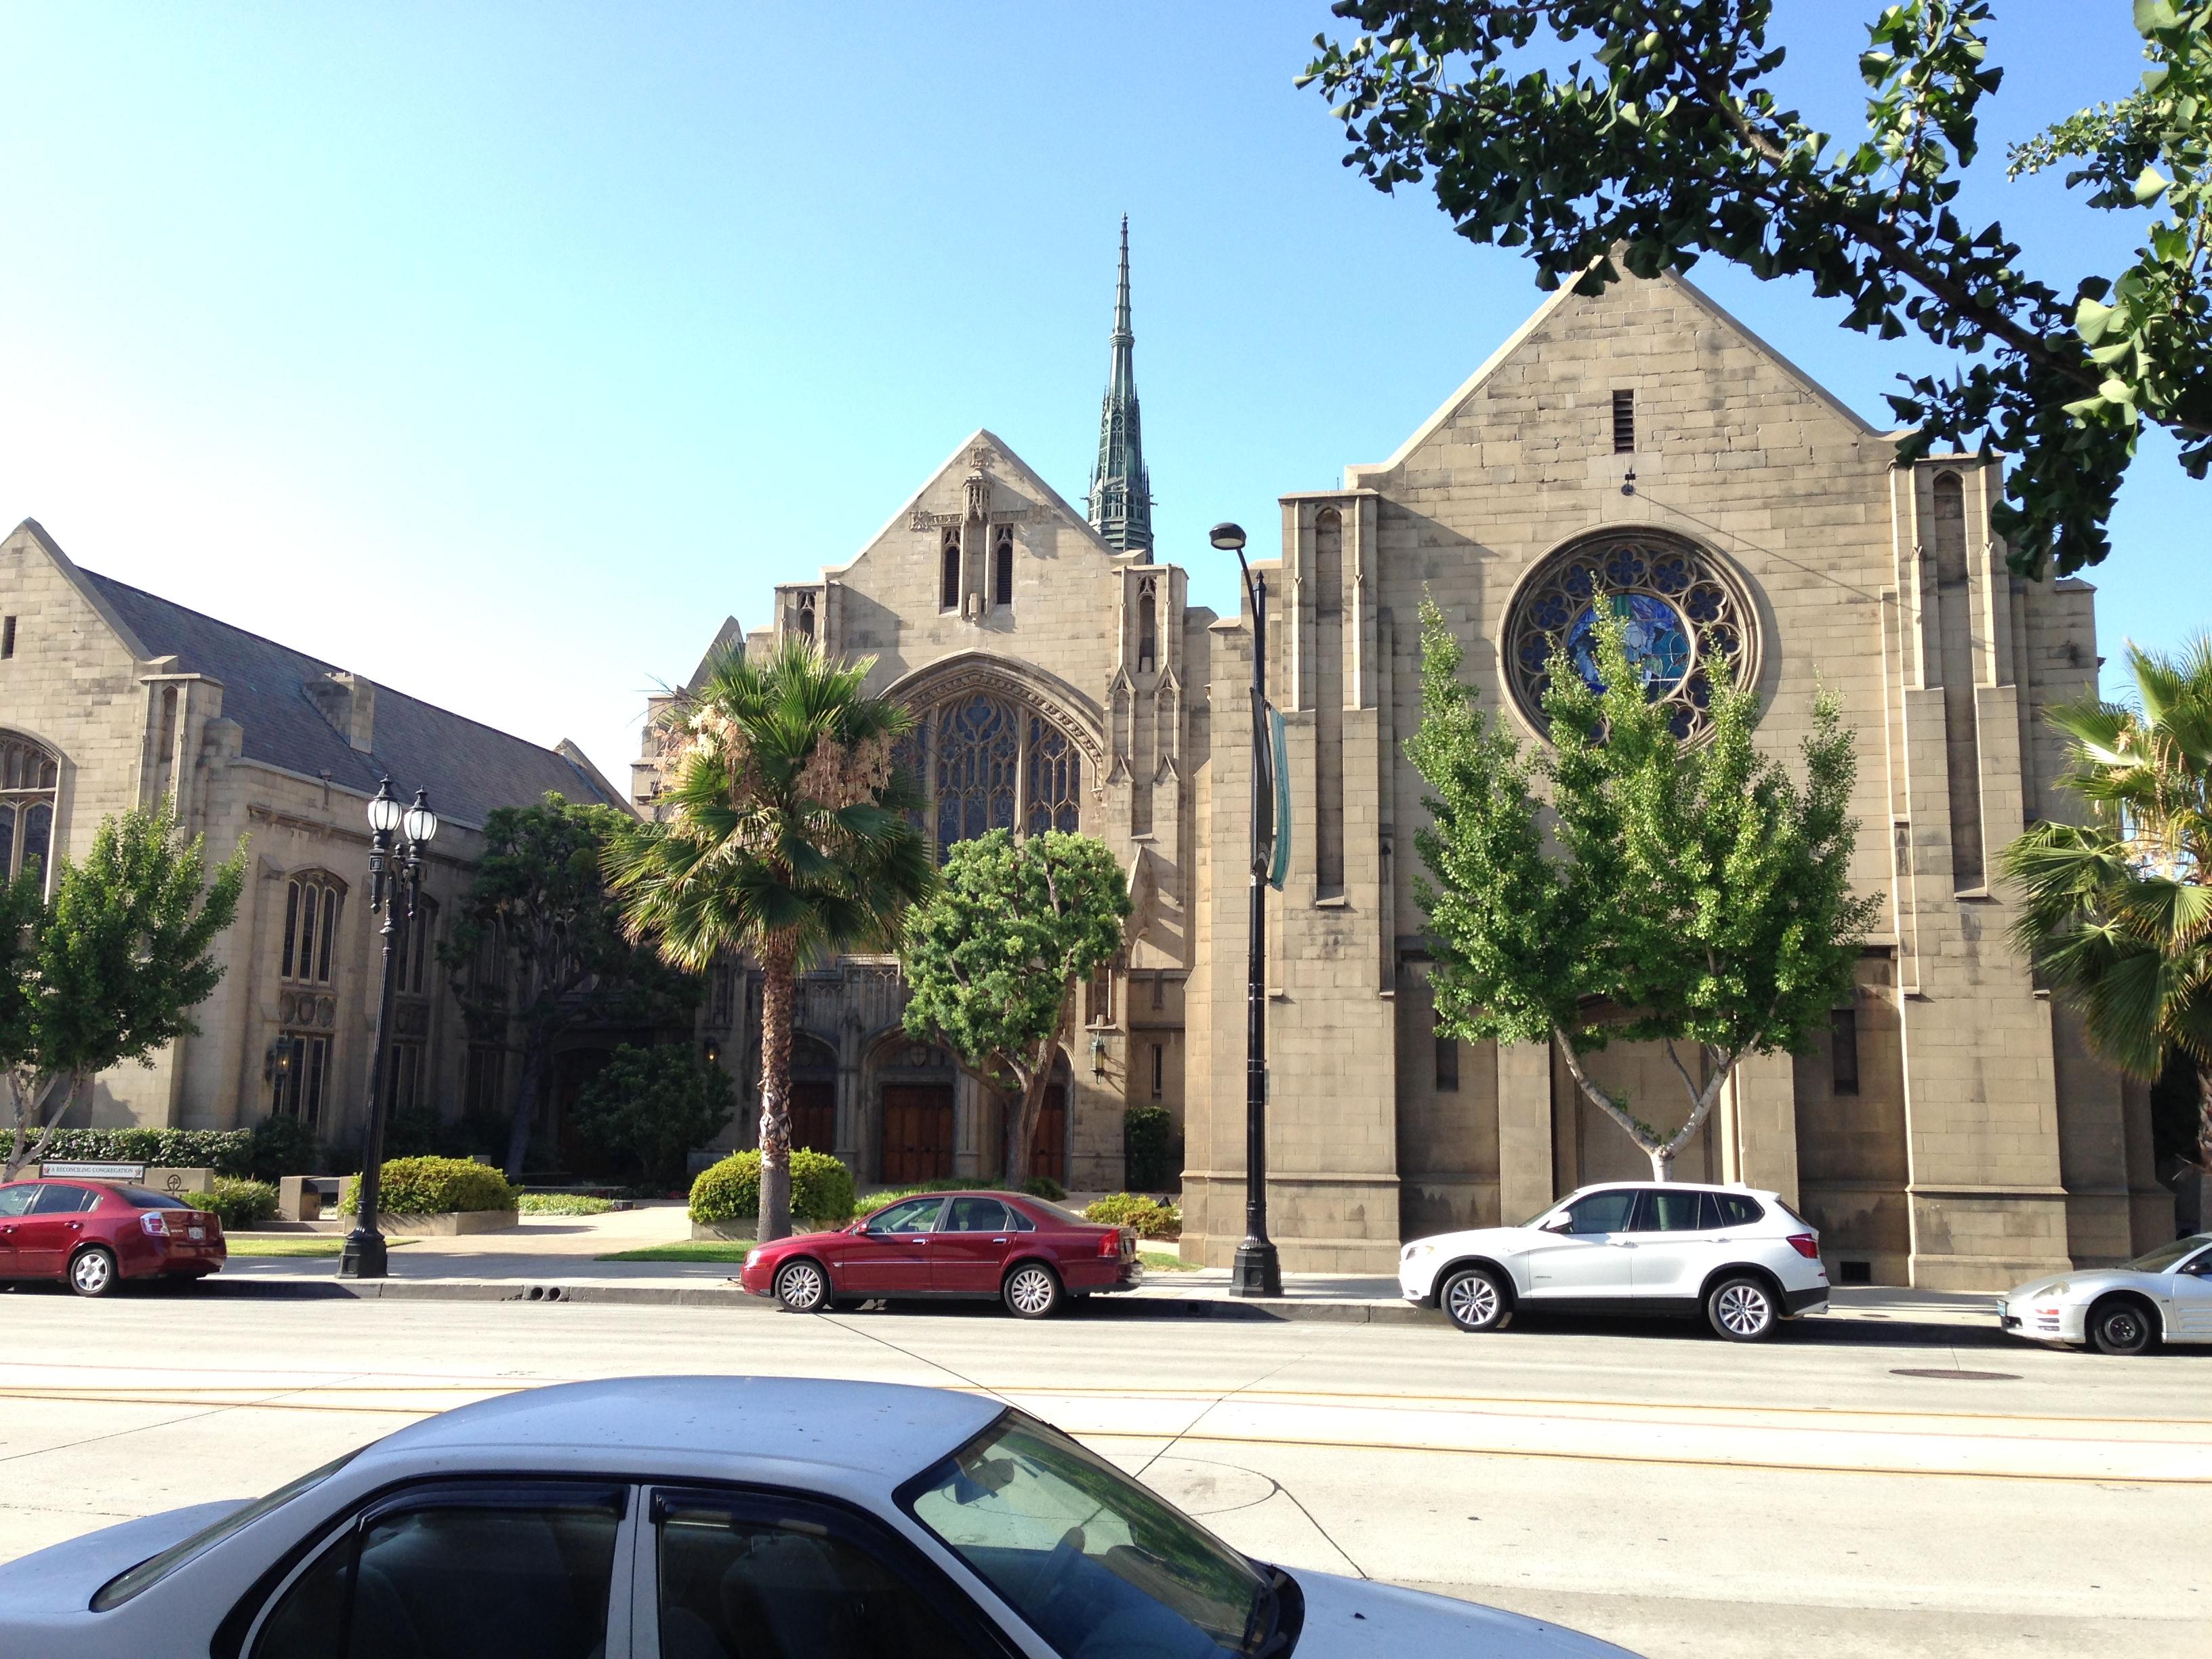 The church nearby. (Botcon Day 1)